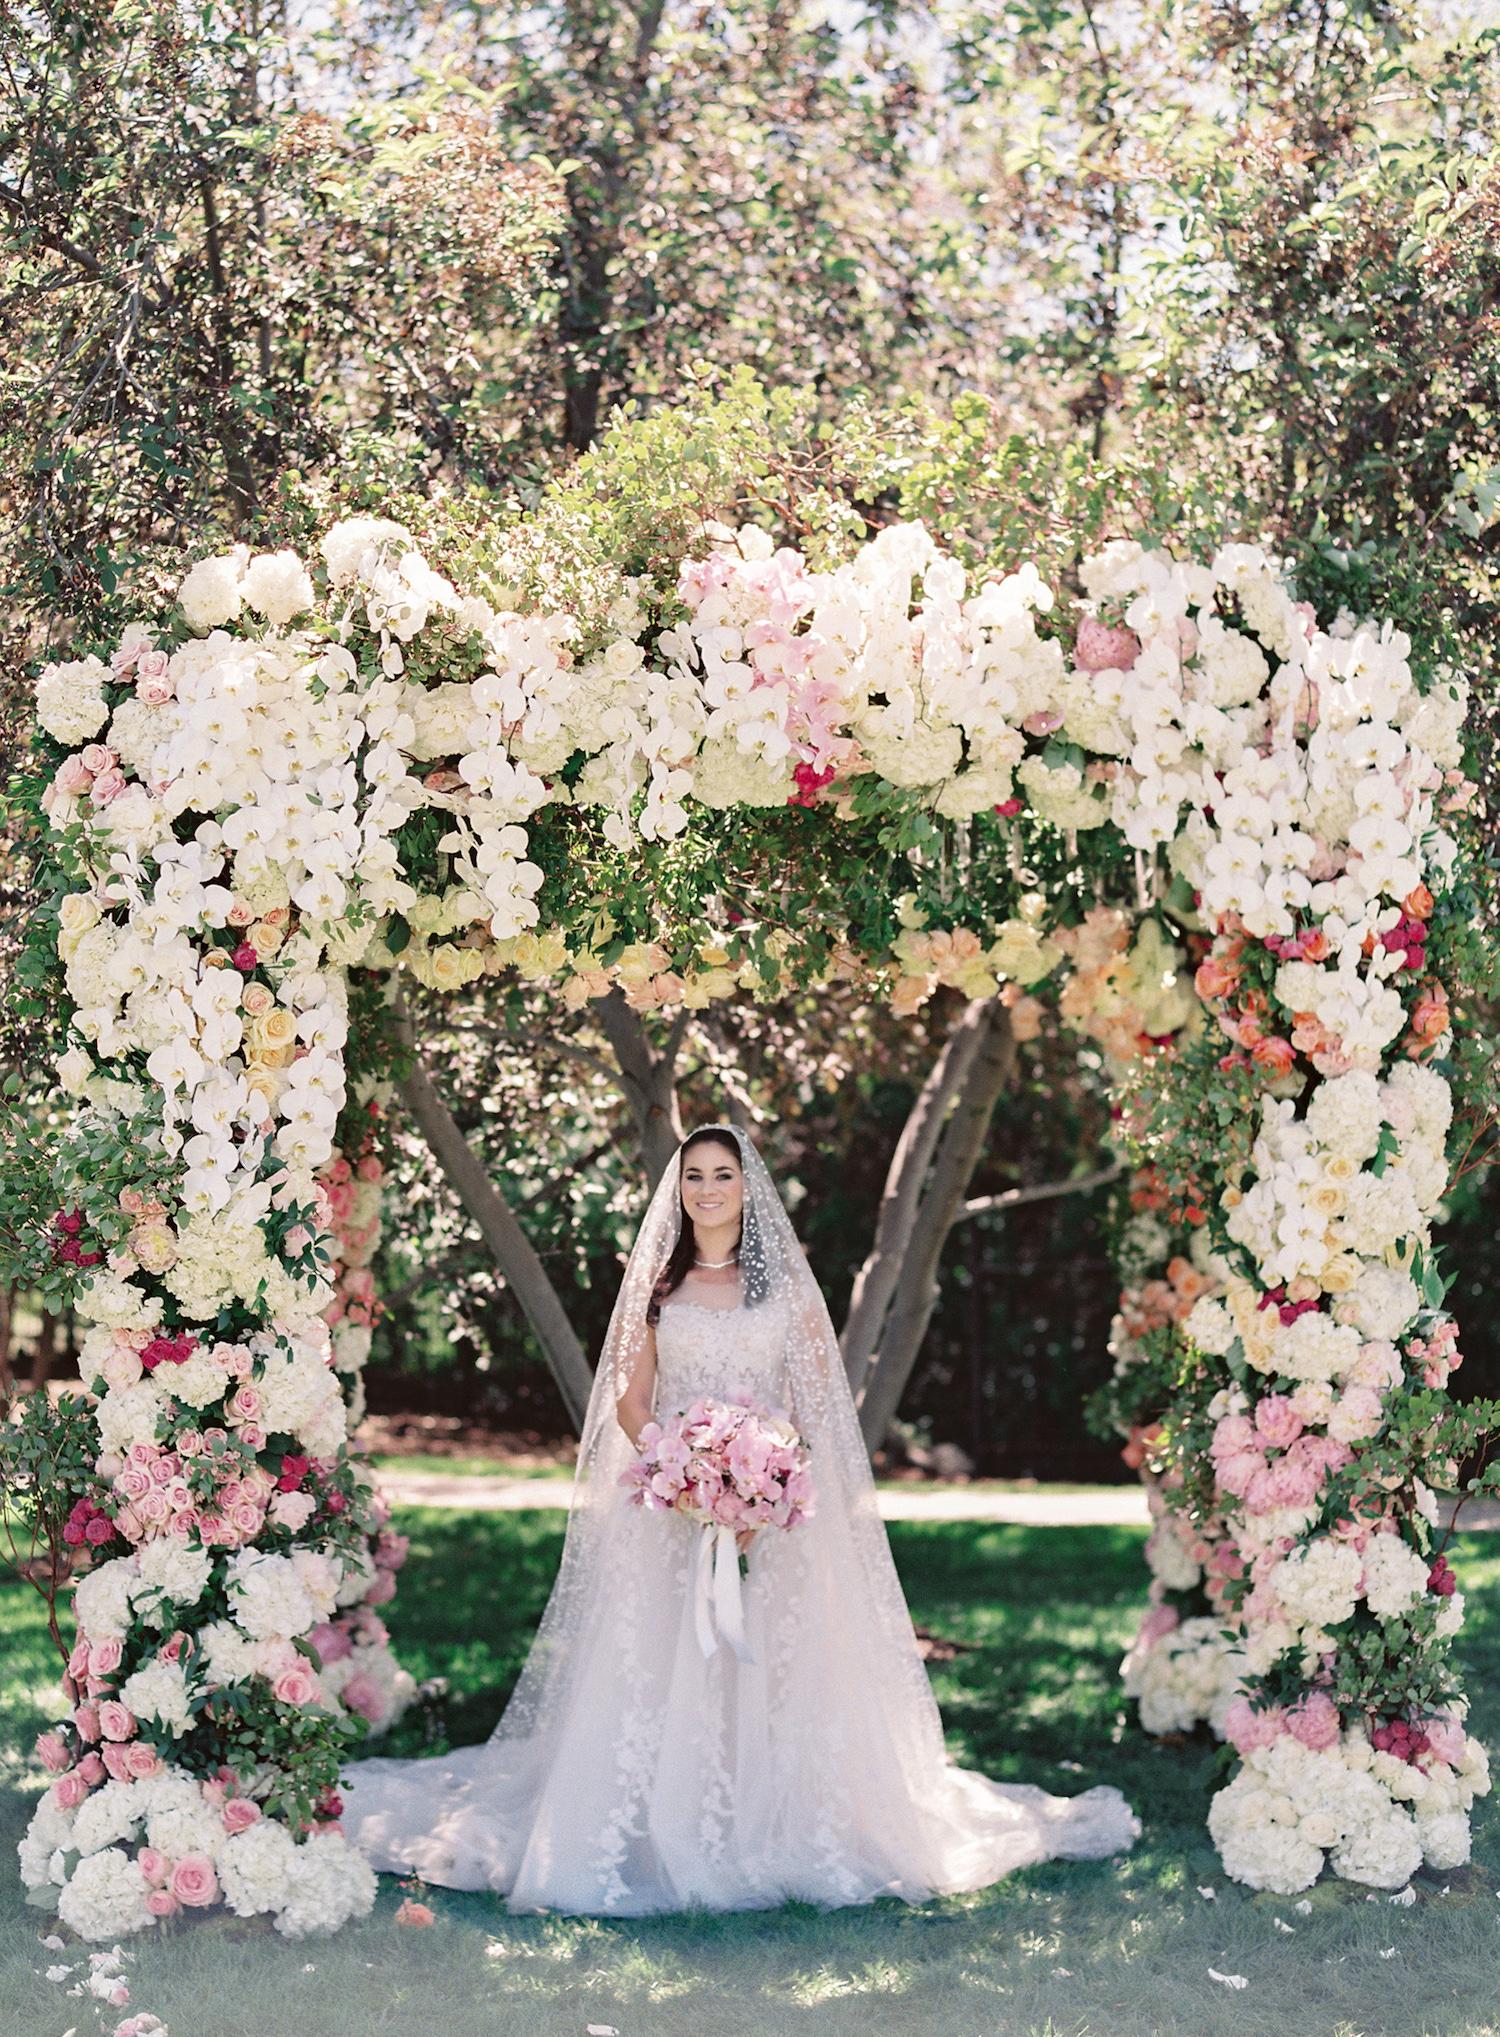 bride-under-lavish-floral-chuppah